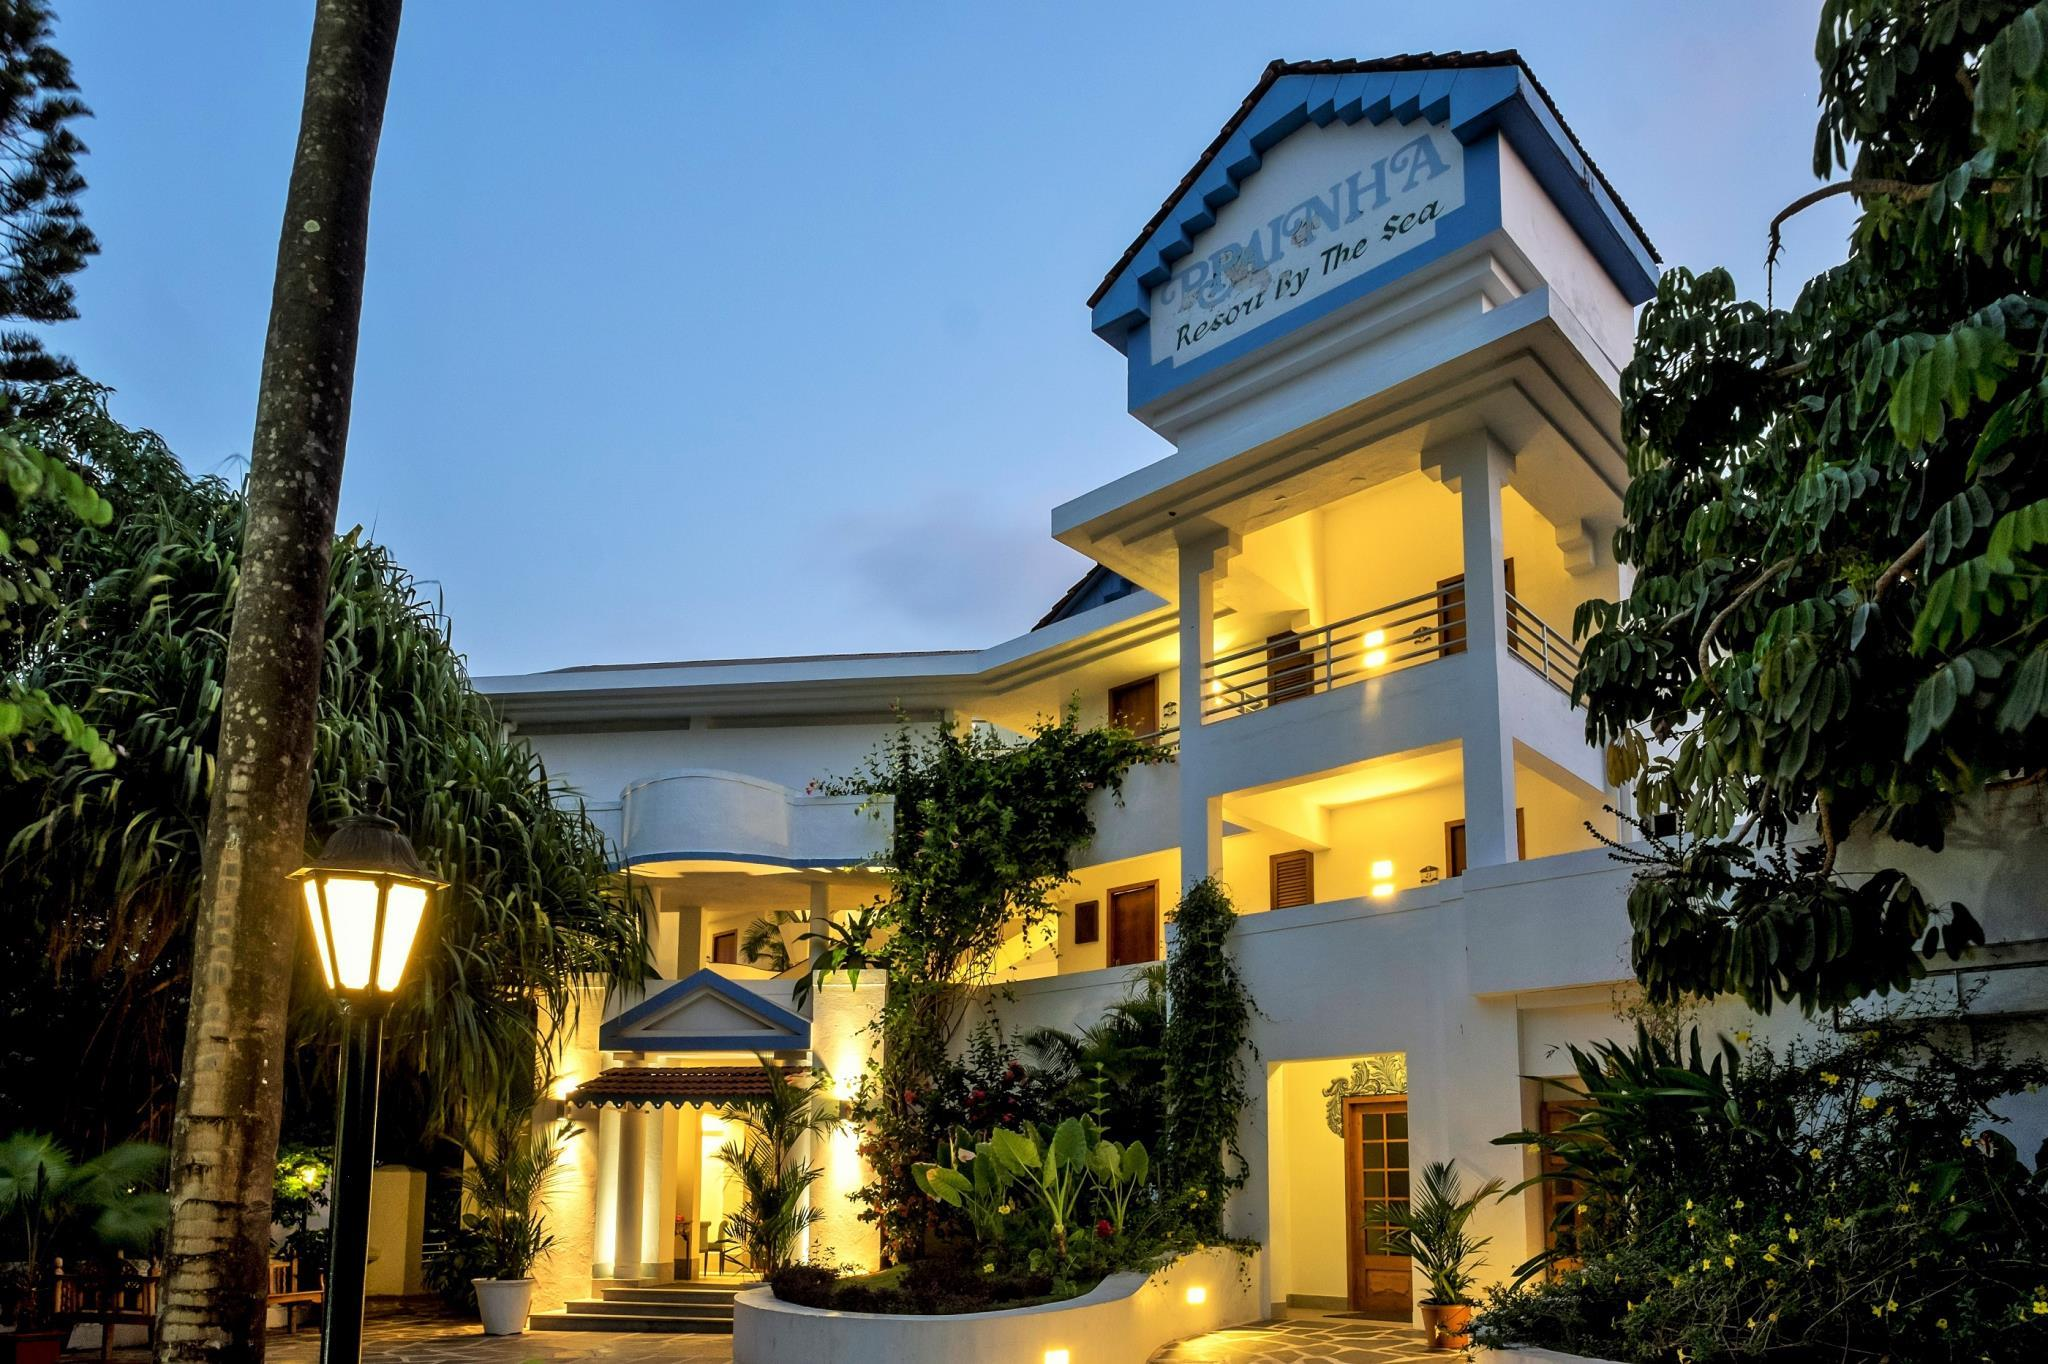 Prainha Resort By The Sea